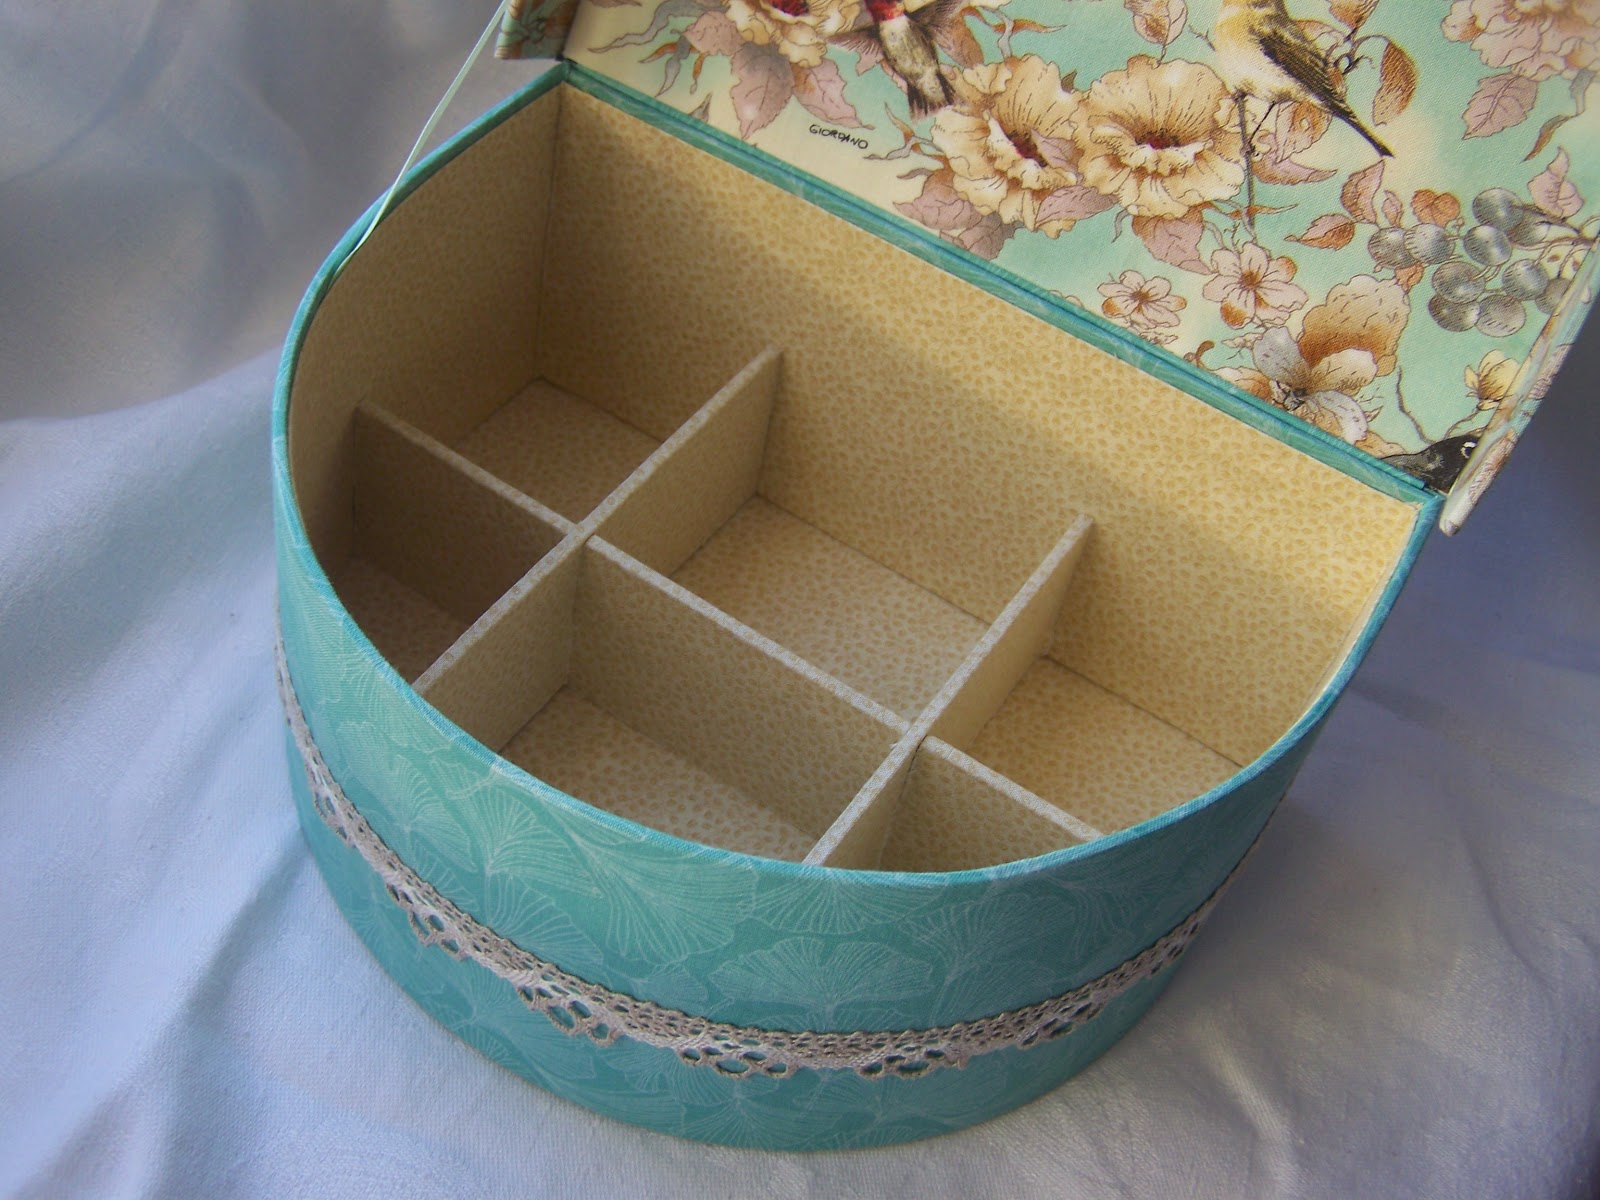 Шкатулка из картонных коробок своими руками